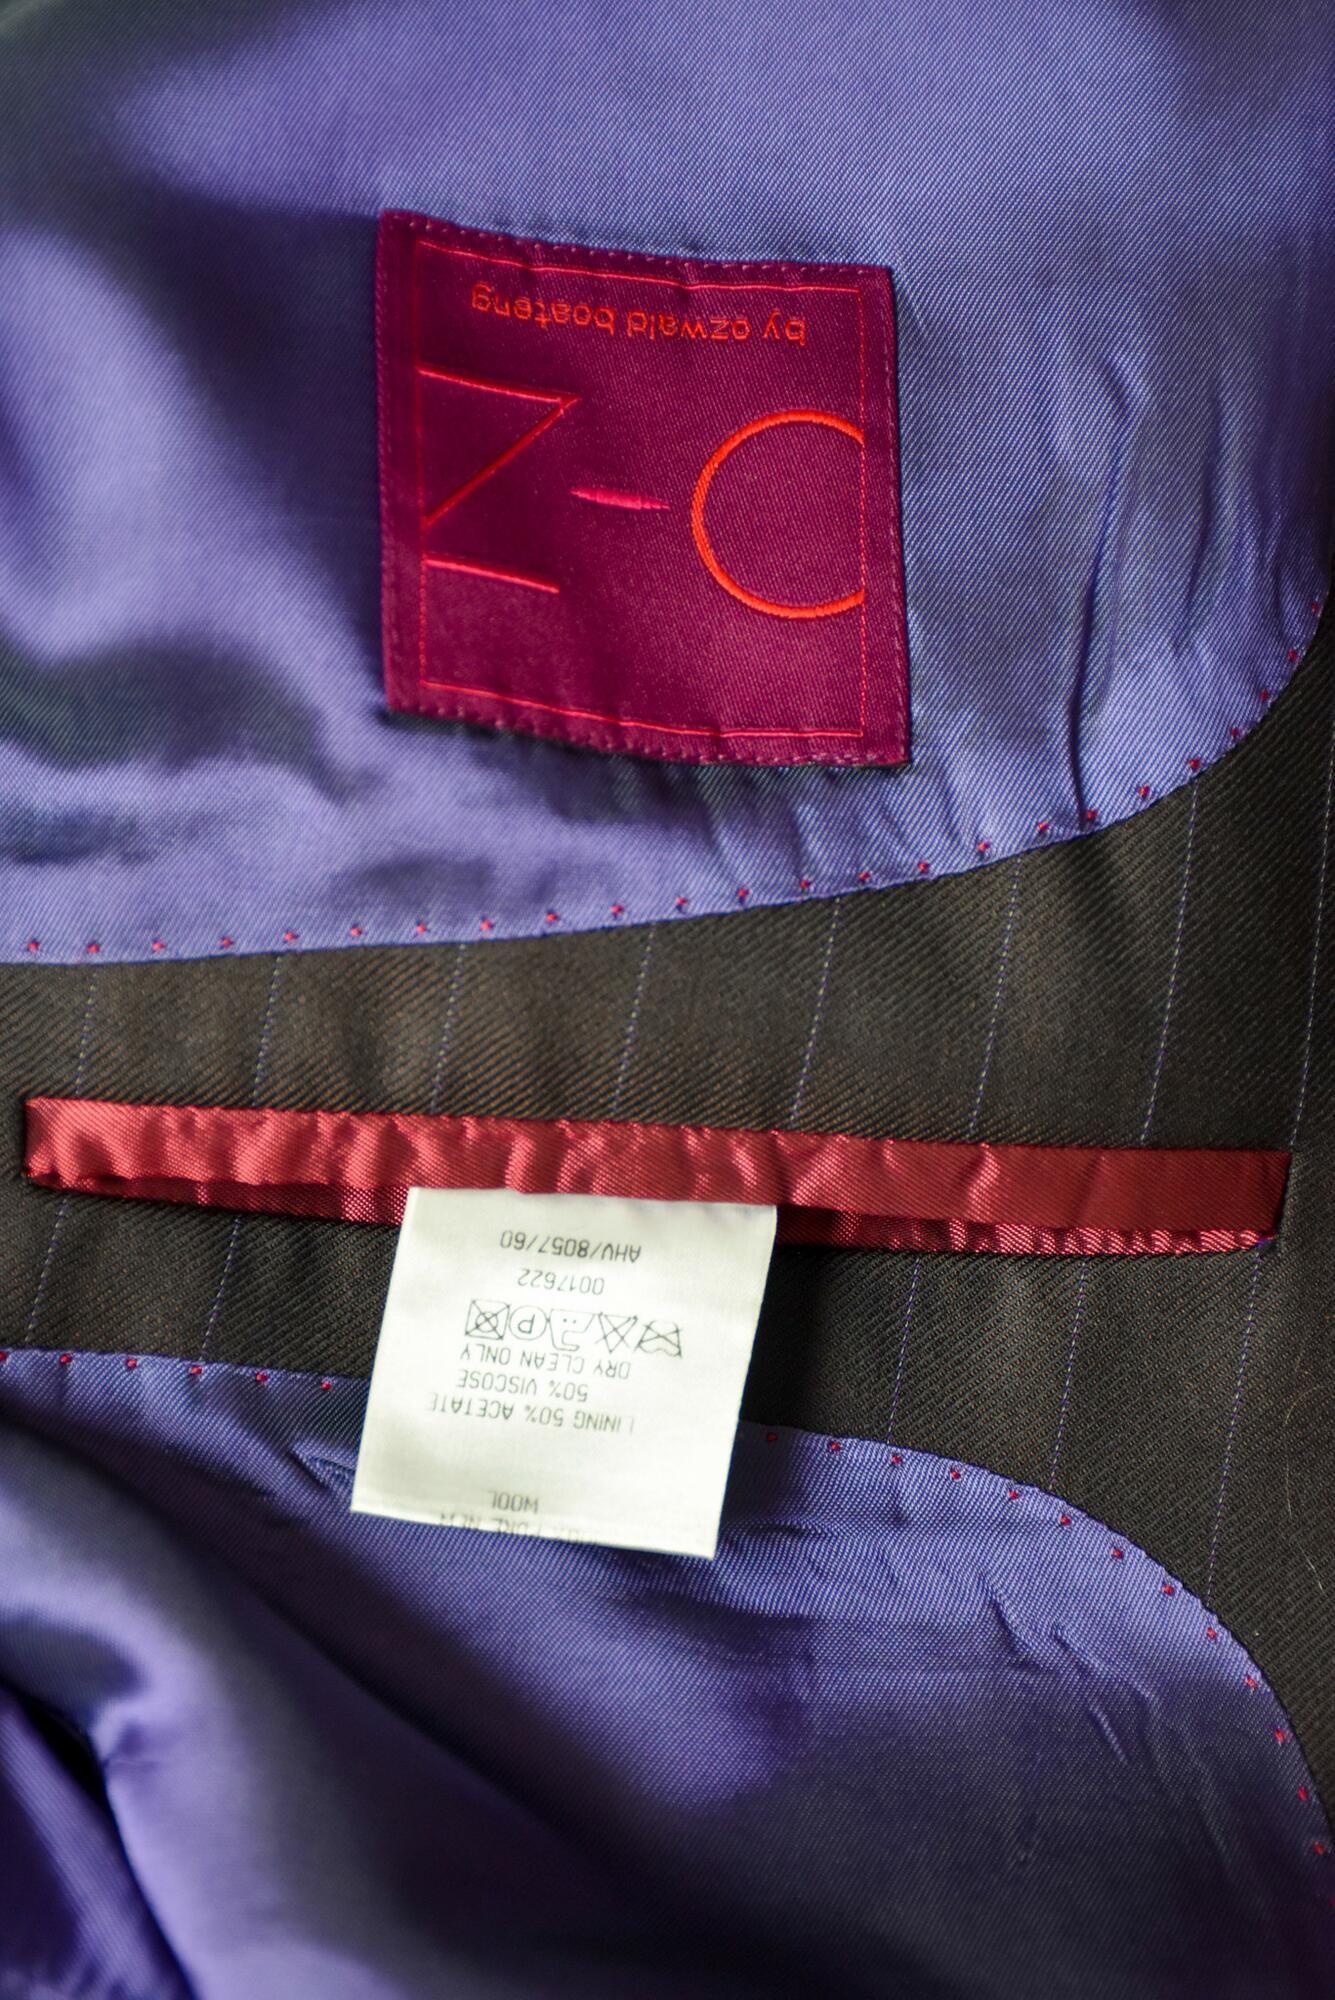 Luksusowa marynarka Ozwald Boateng - PONOŚ SE vintage shop | JestemSlow.pl